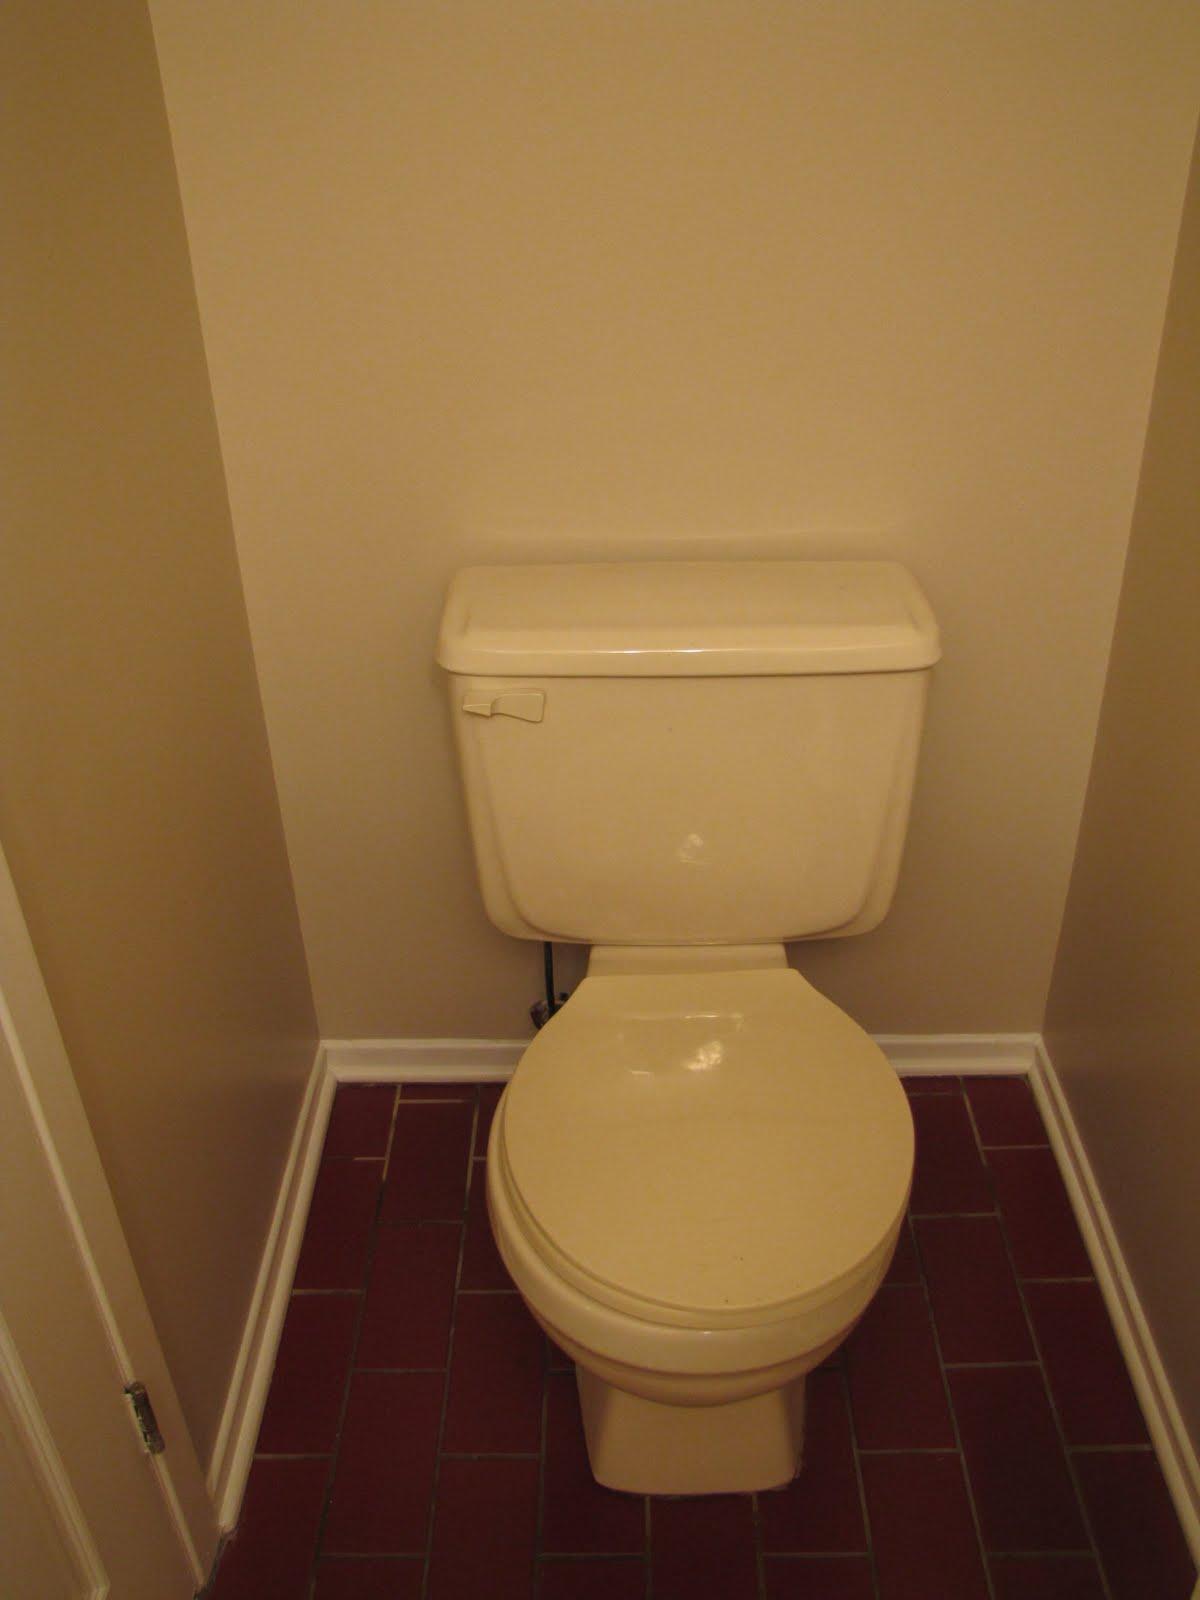 mashababko: Wallpaper Around Toilet